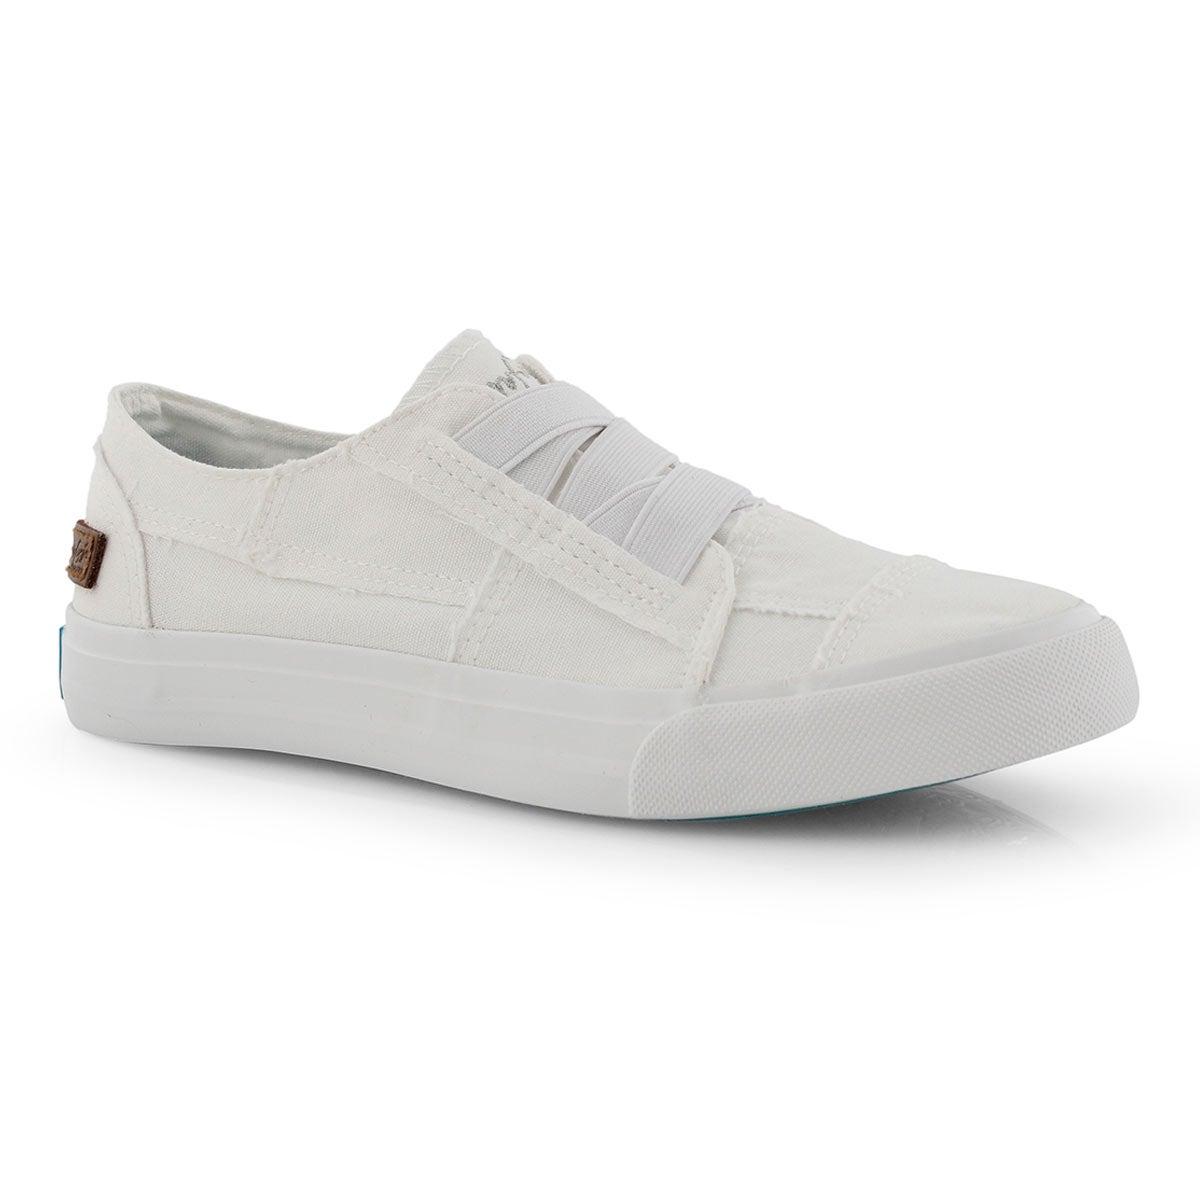 Lds Marley white slip on fashion sneaker